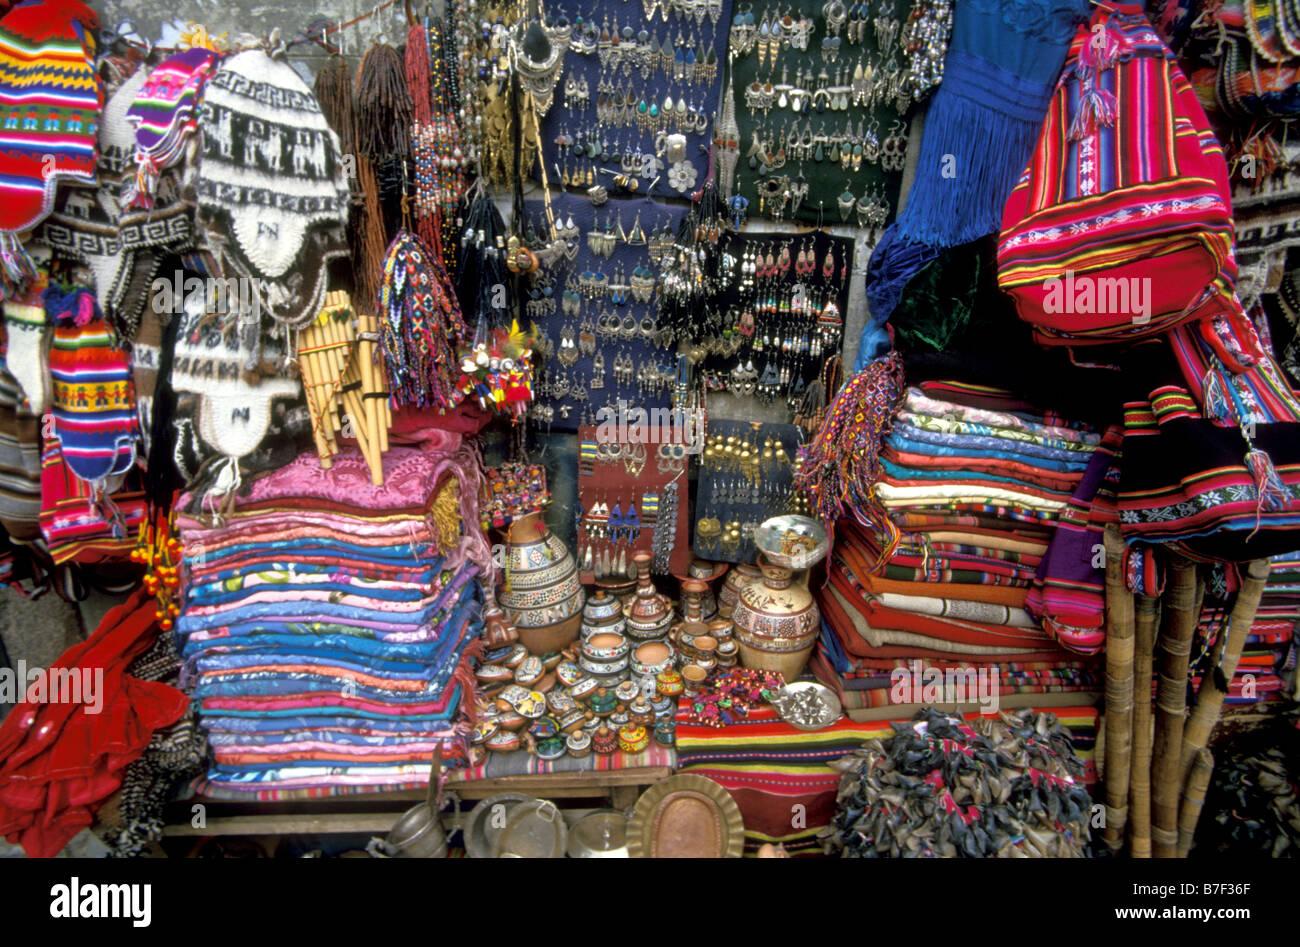 Bolivian Witch Craft Market